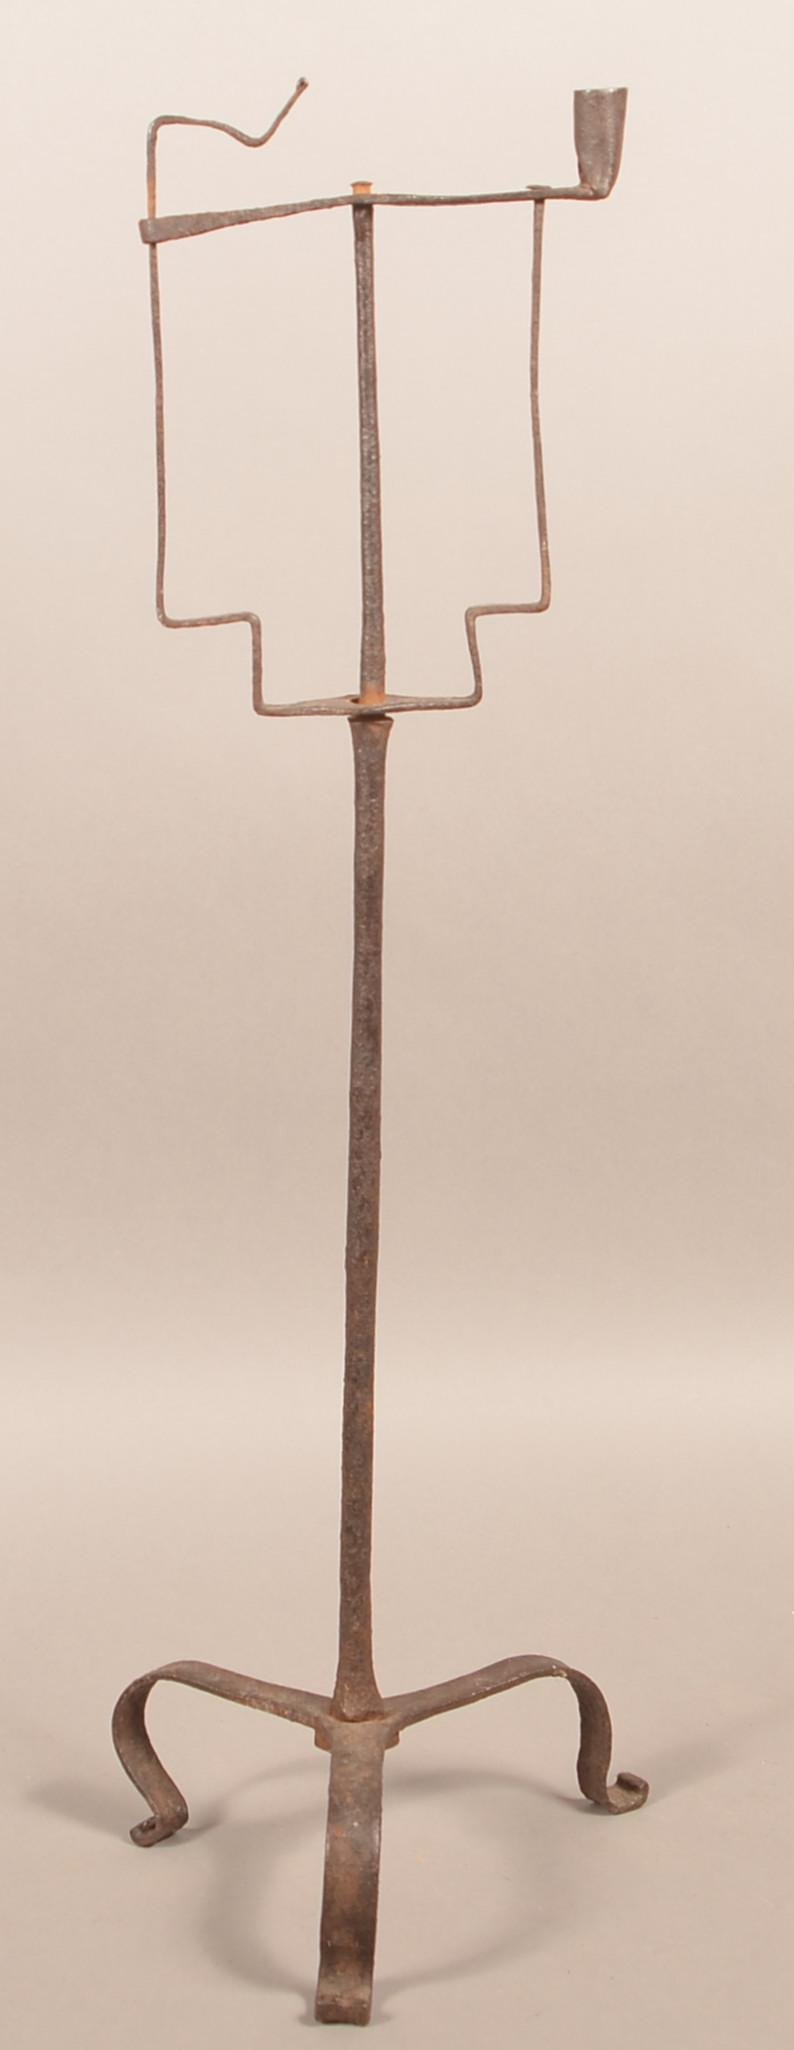 Antique Wrought Iron Combination Lamp.